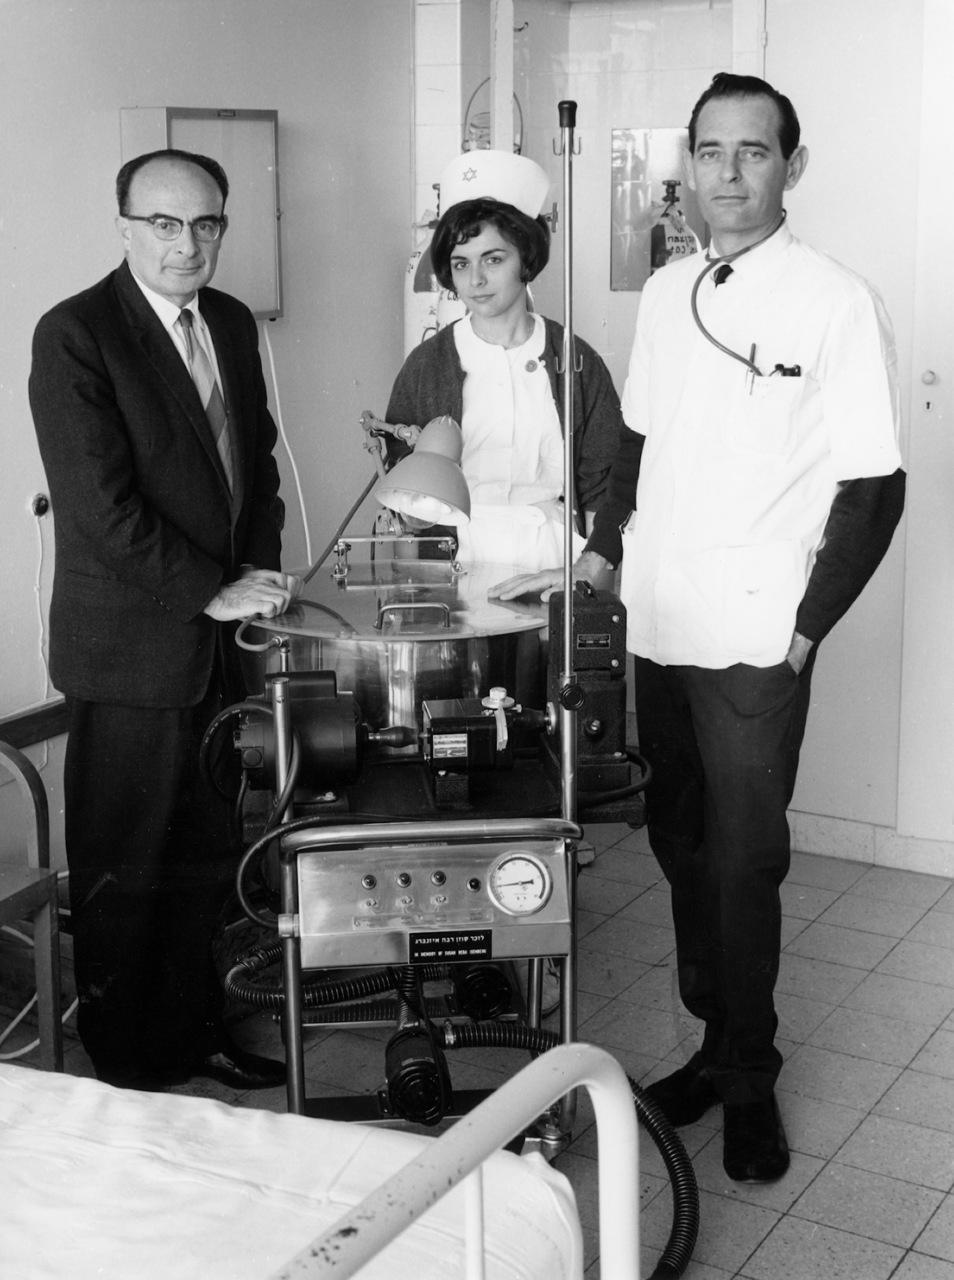 the first dialysis machine at Rambam hospital, Haifa, Israel, 1965